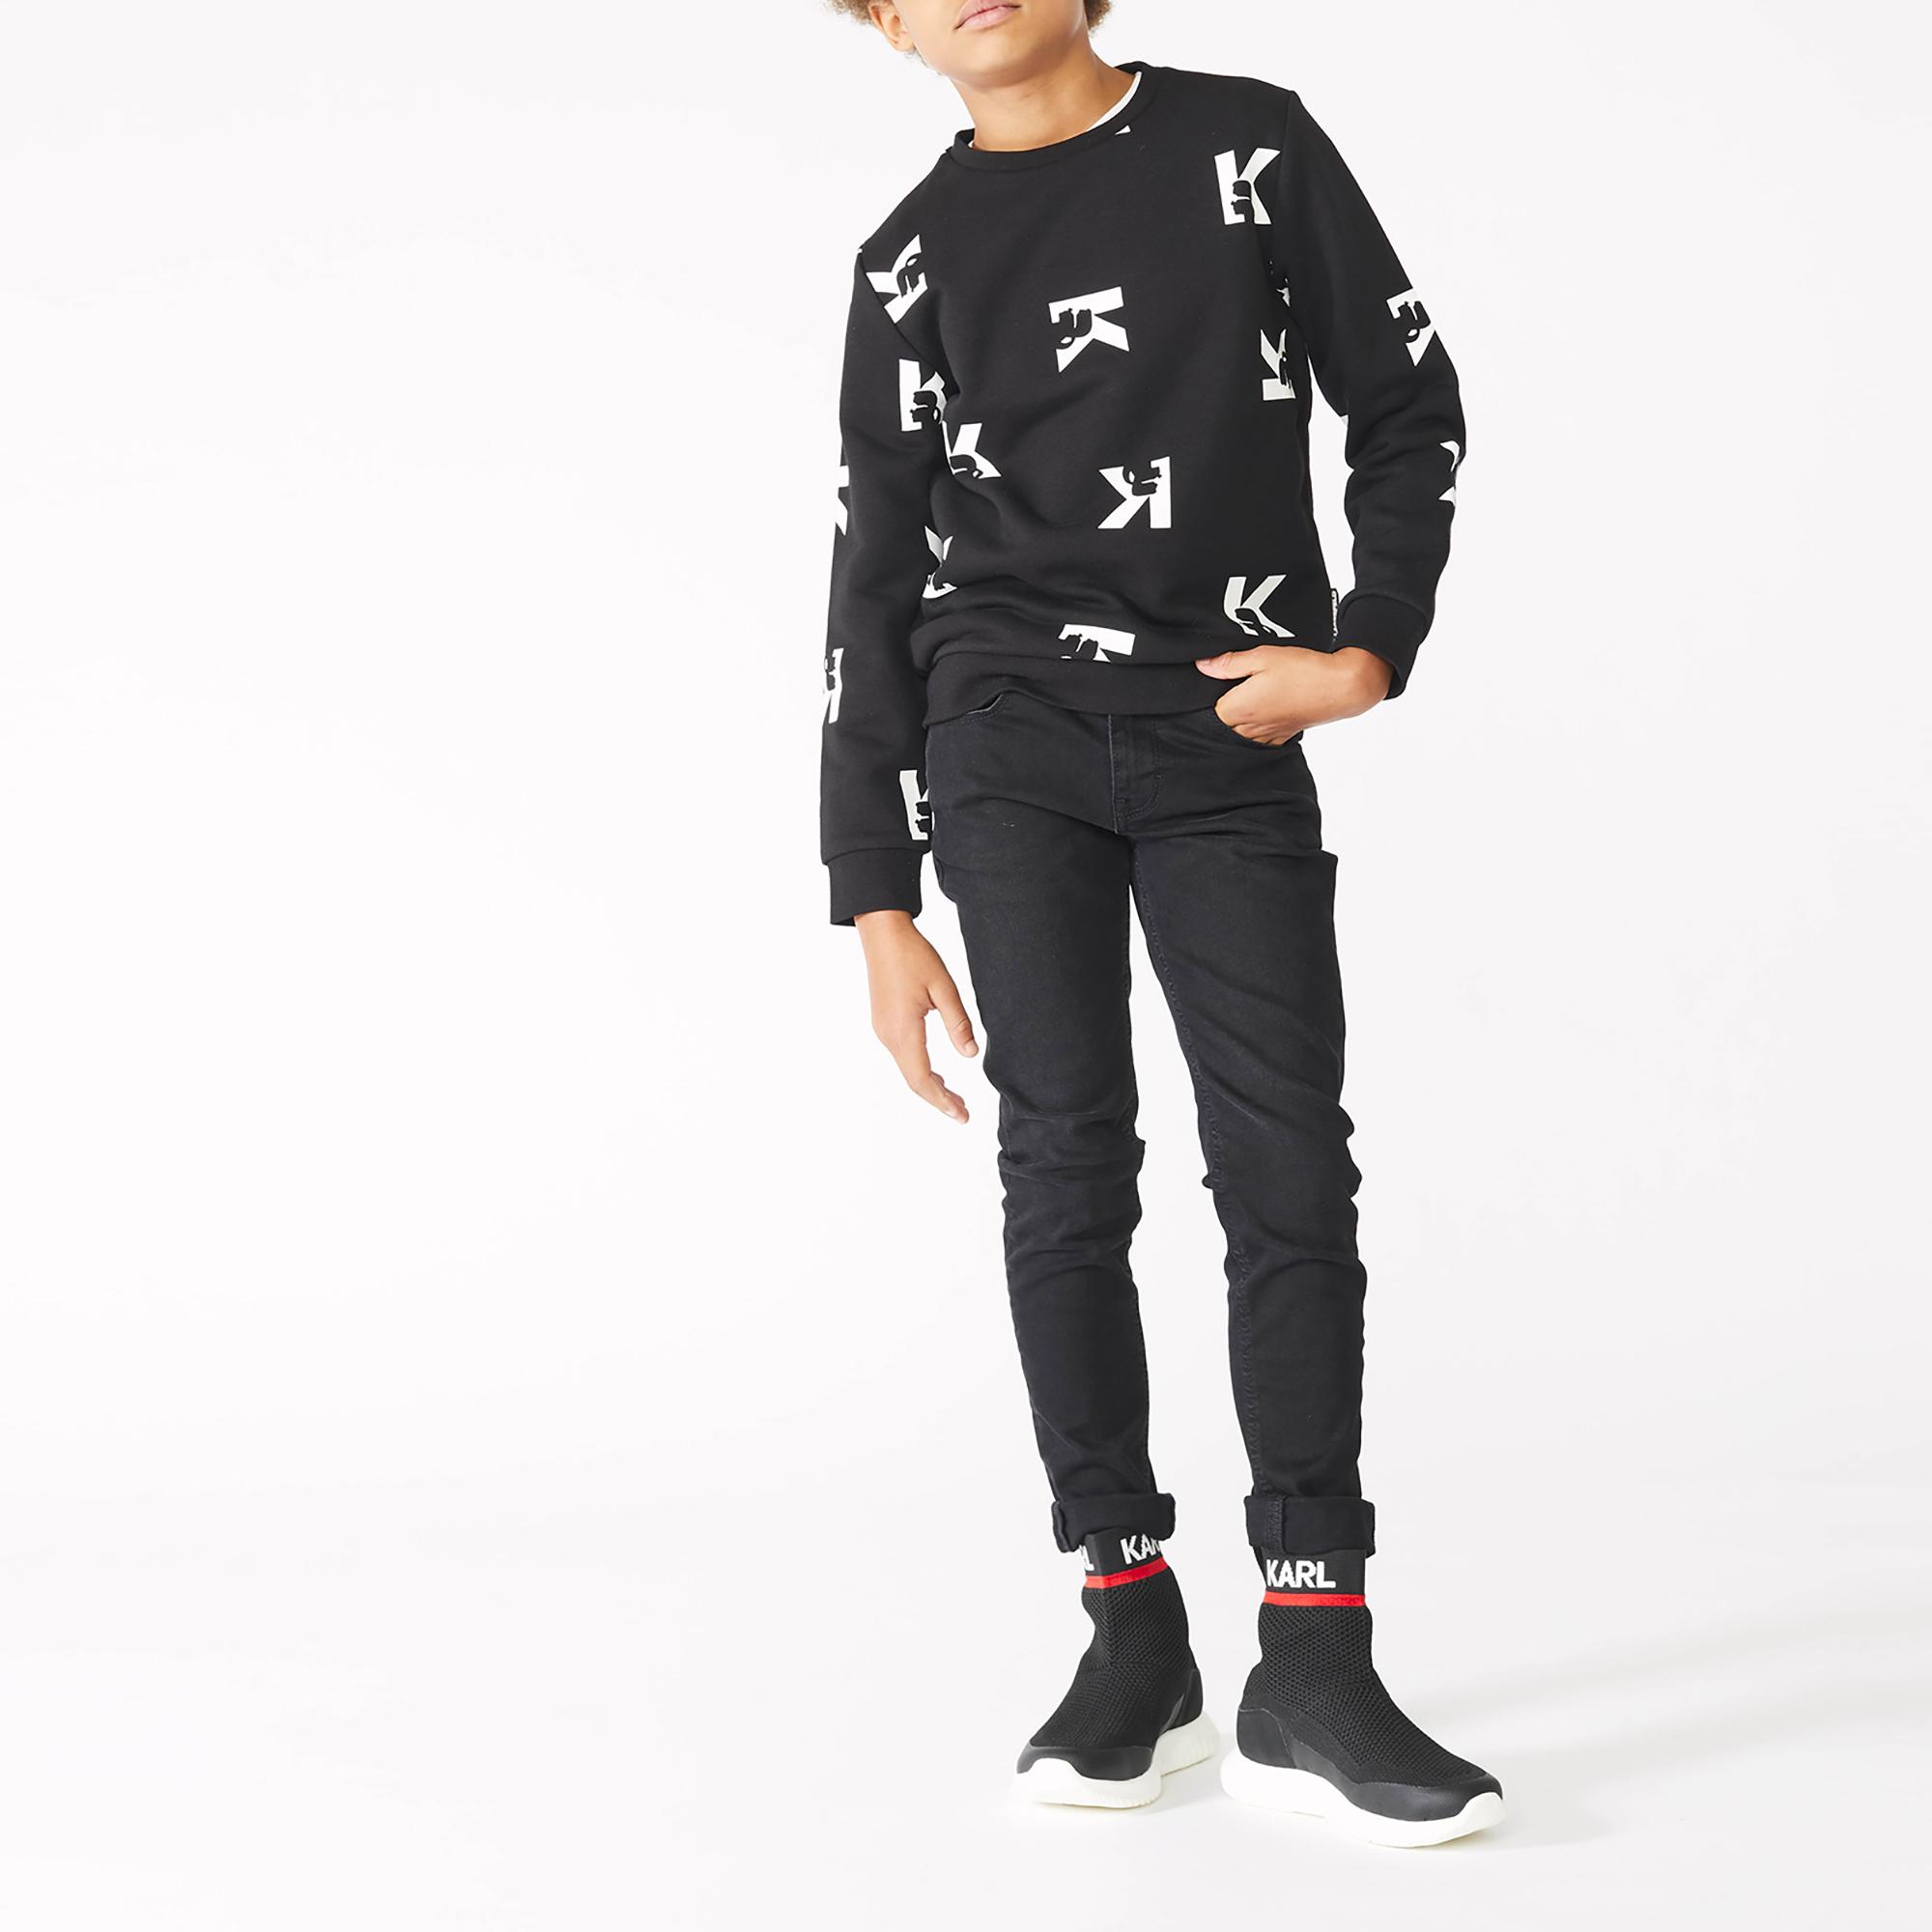 K-print sweatshirt KARL LAGERFELD KIDS for BOY